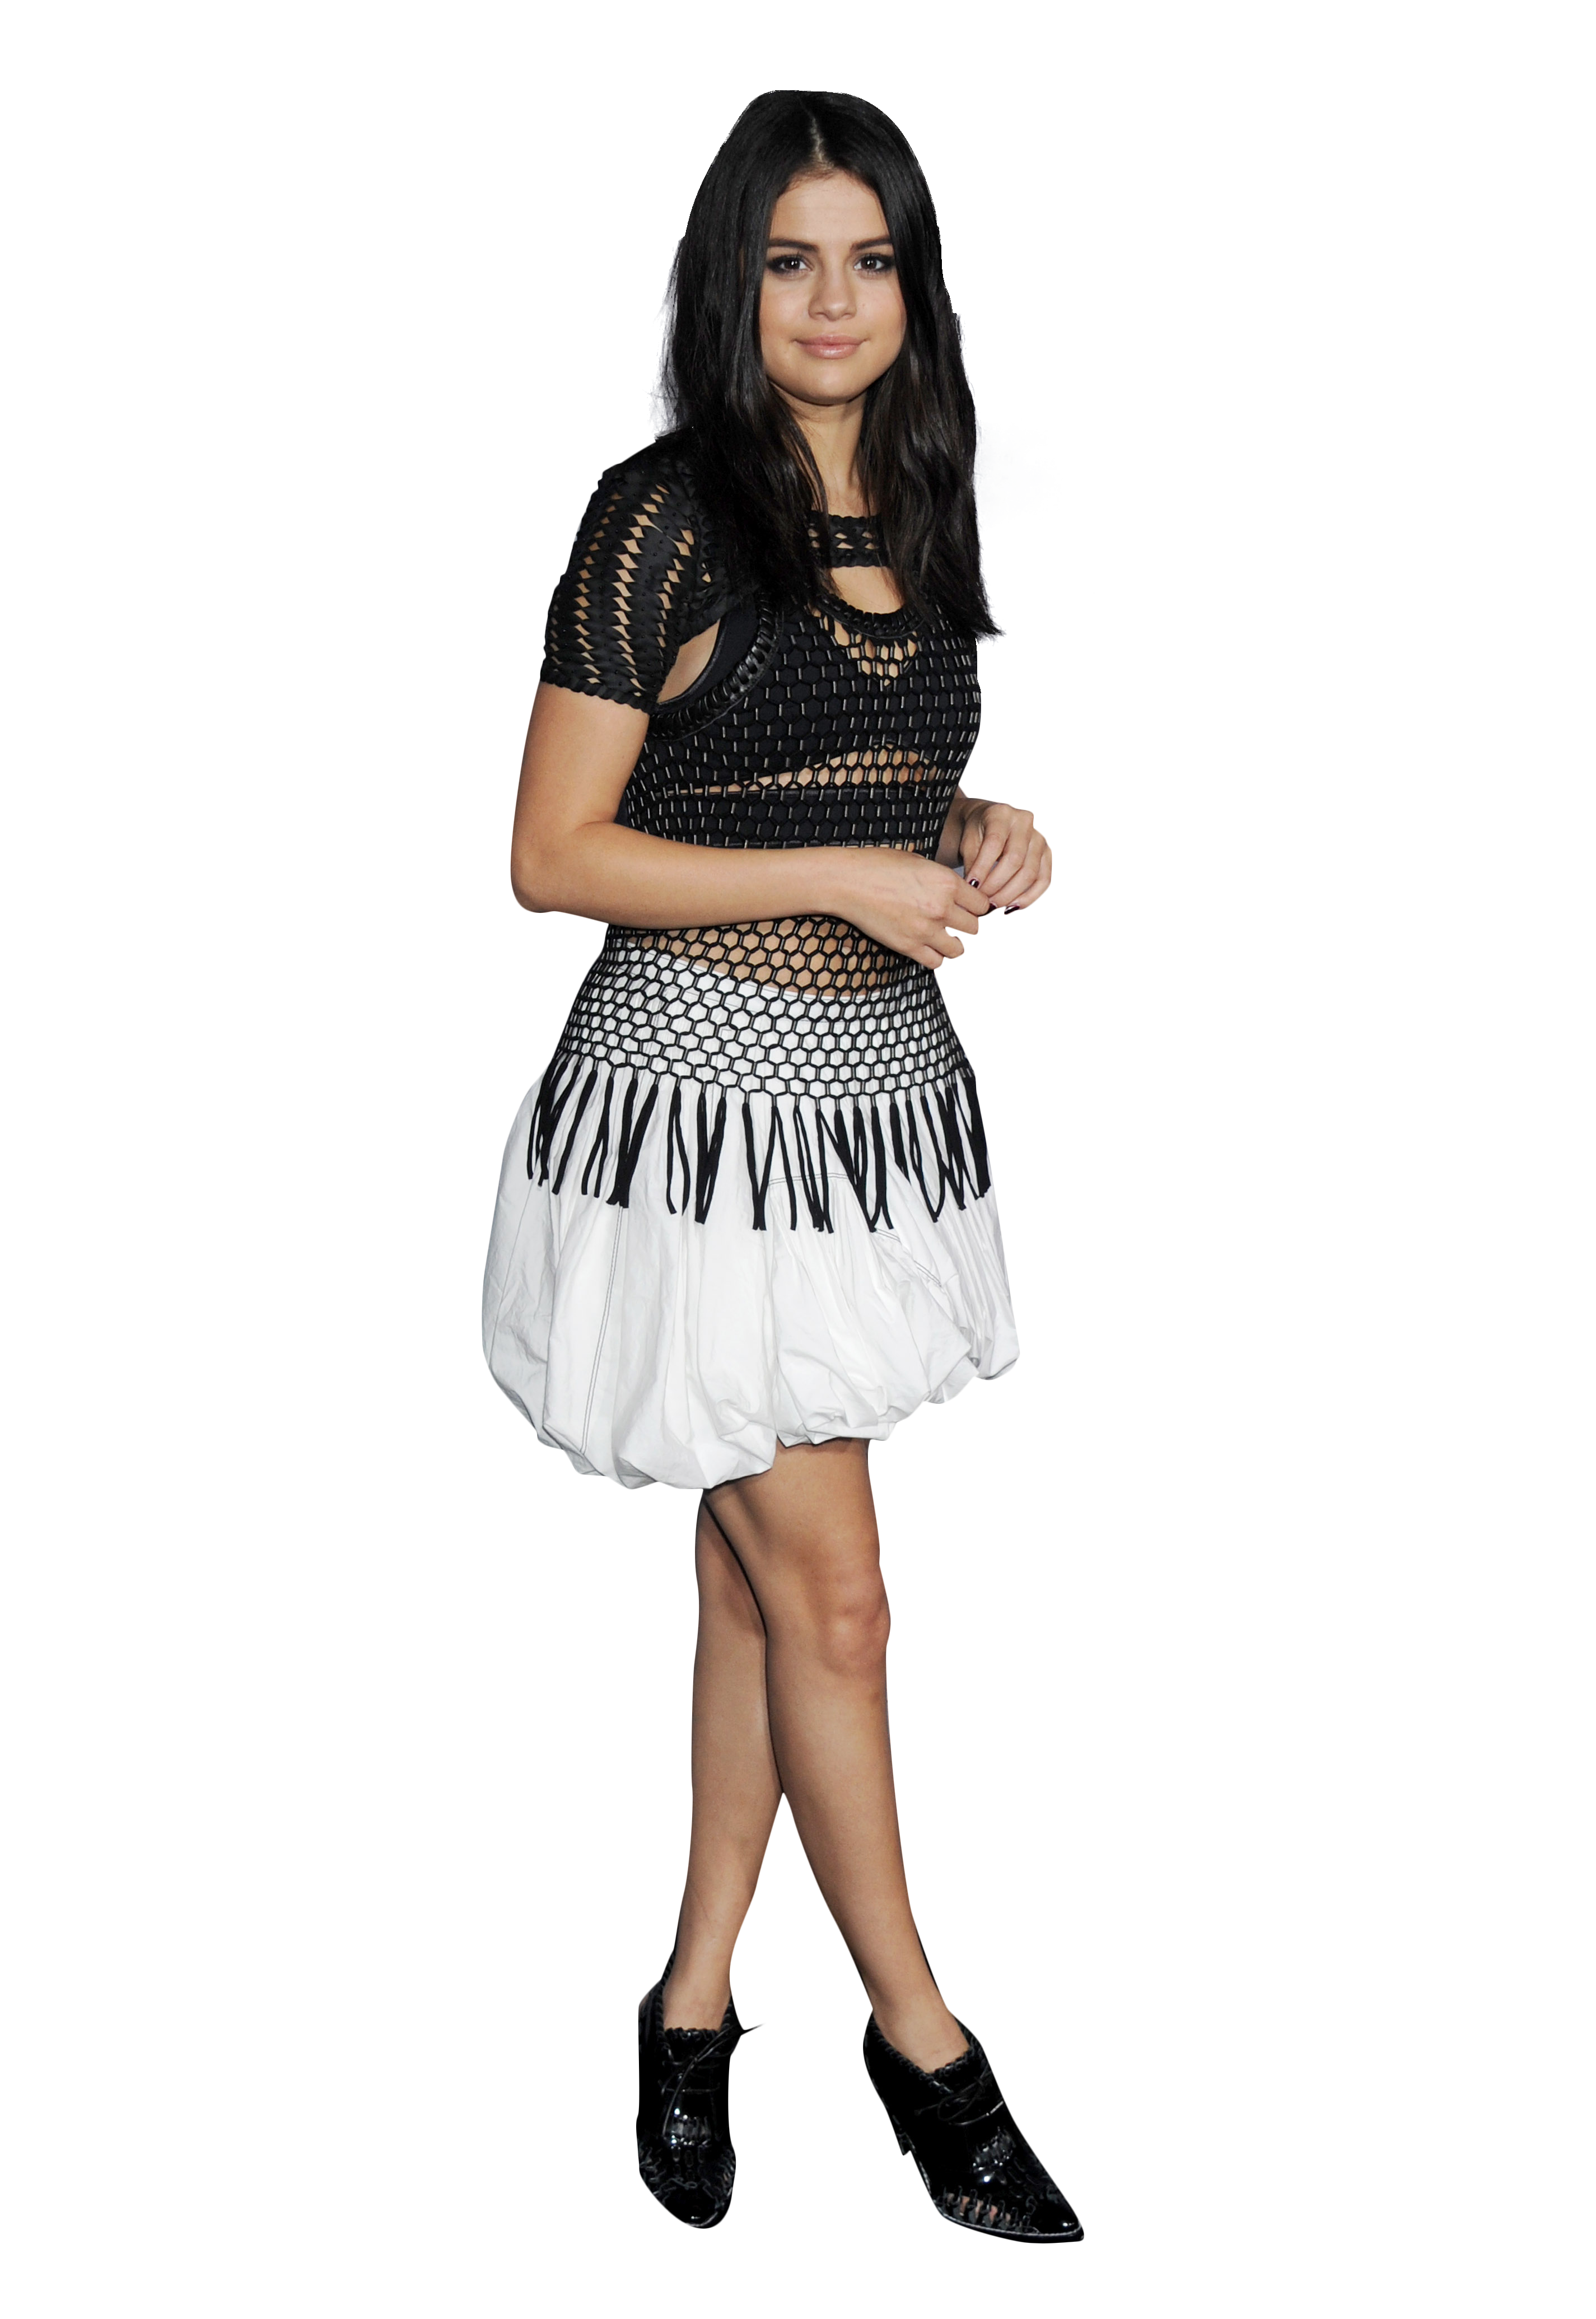 Selena Gomez White Dress PNG Image Selena gomez white